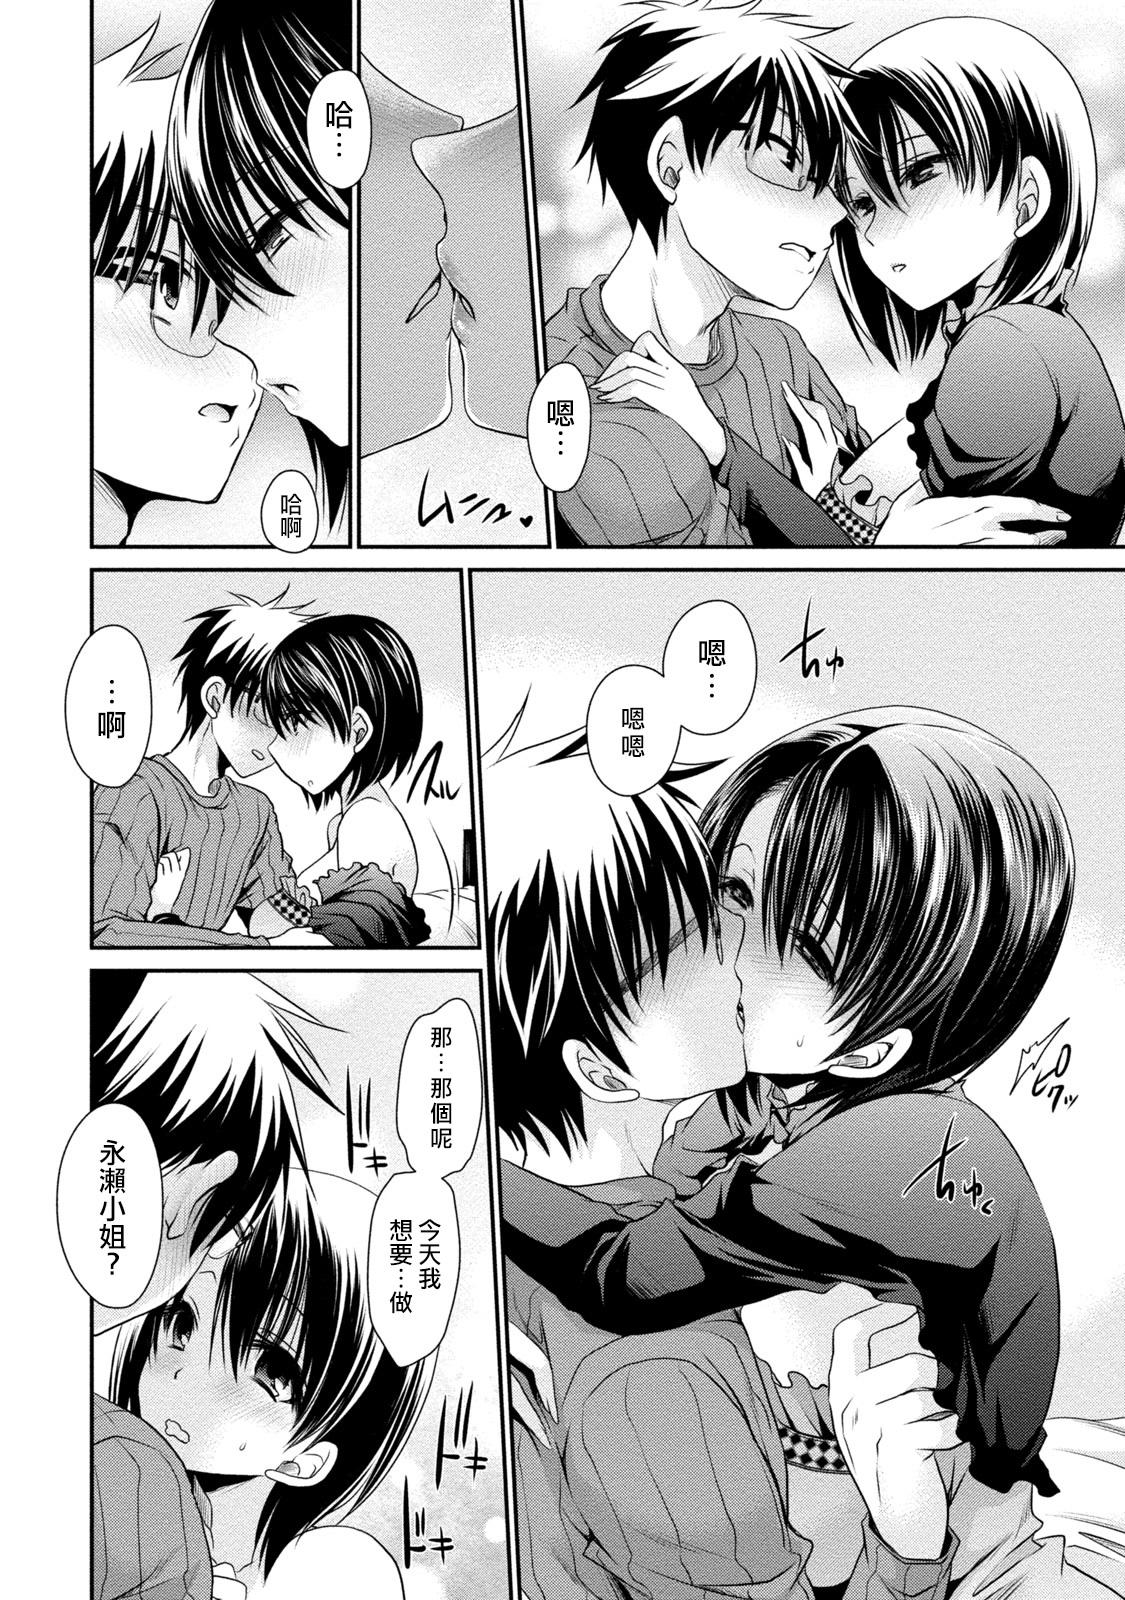 [Shinonome Ryu] Ore to Kanojo to Owaru Sekai - World's end LoveStory ch.10-13 [Chinese] [爱弹幕汉化组] [Digital] 17